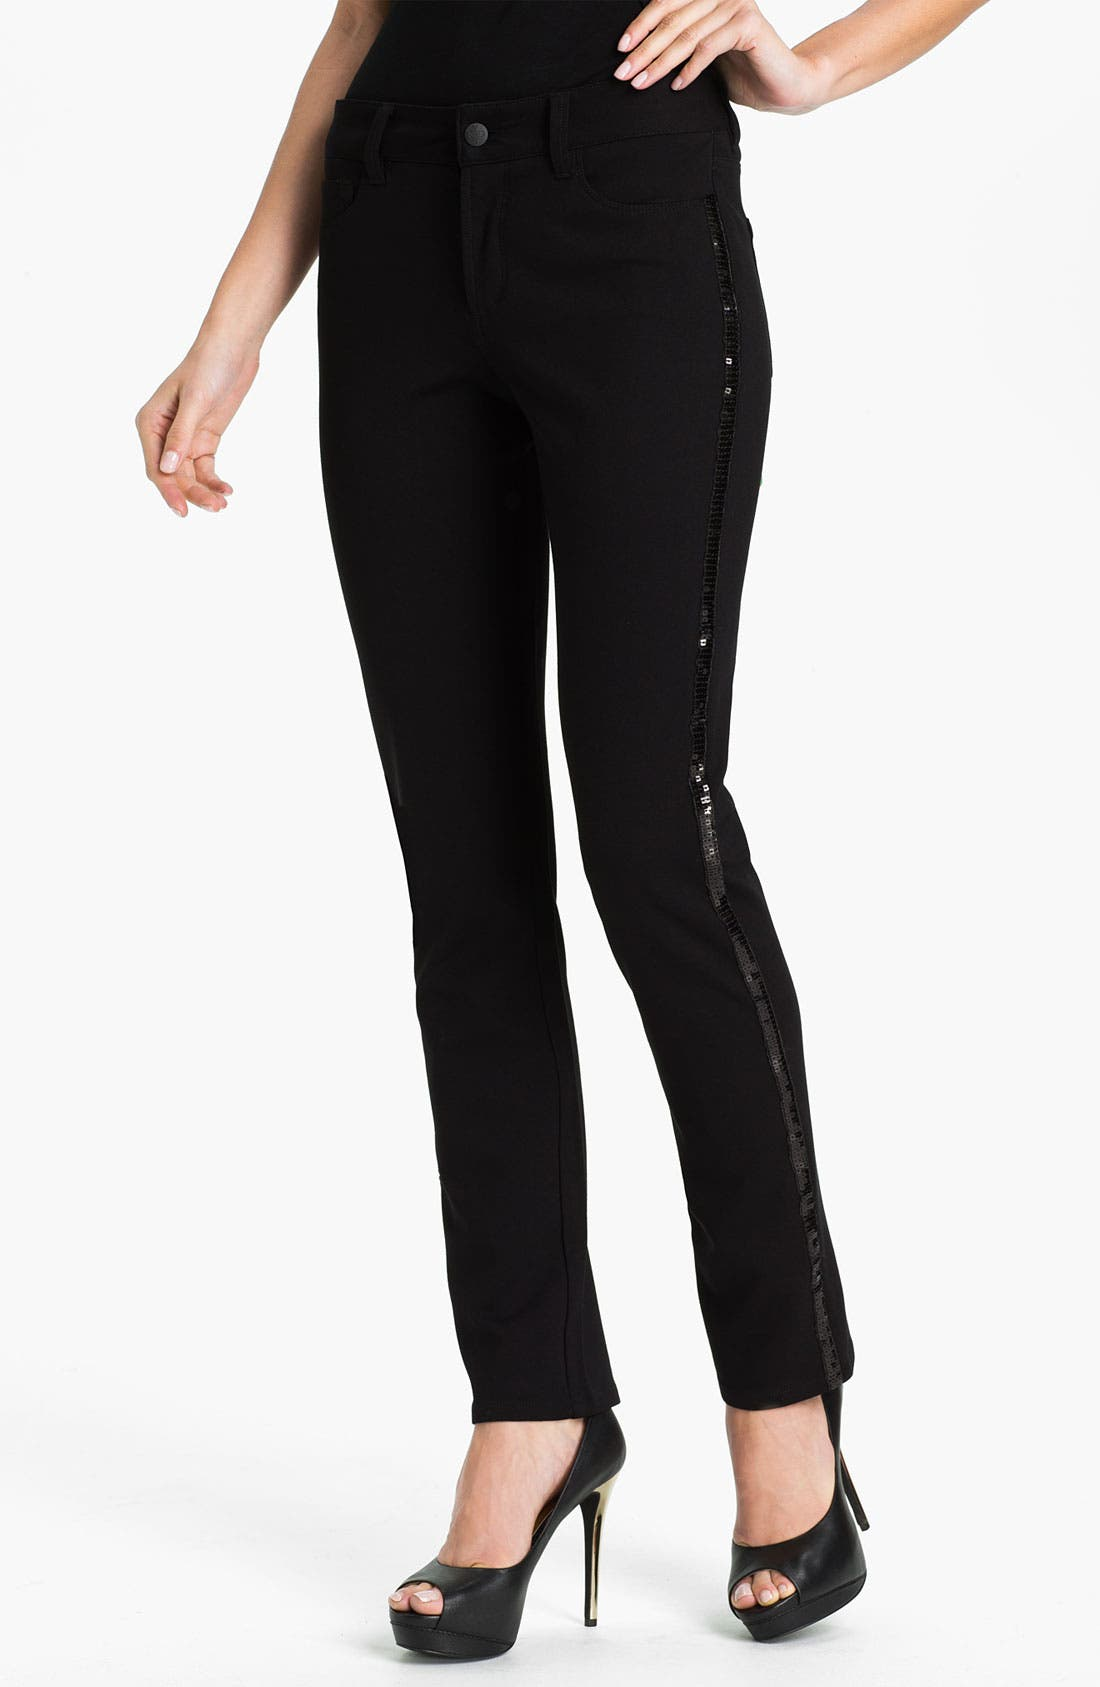 Alternate Image 1 Selected - NYDJ 'Sheri - Tuxedo' Skinny Twill Jeans